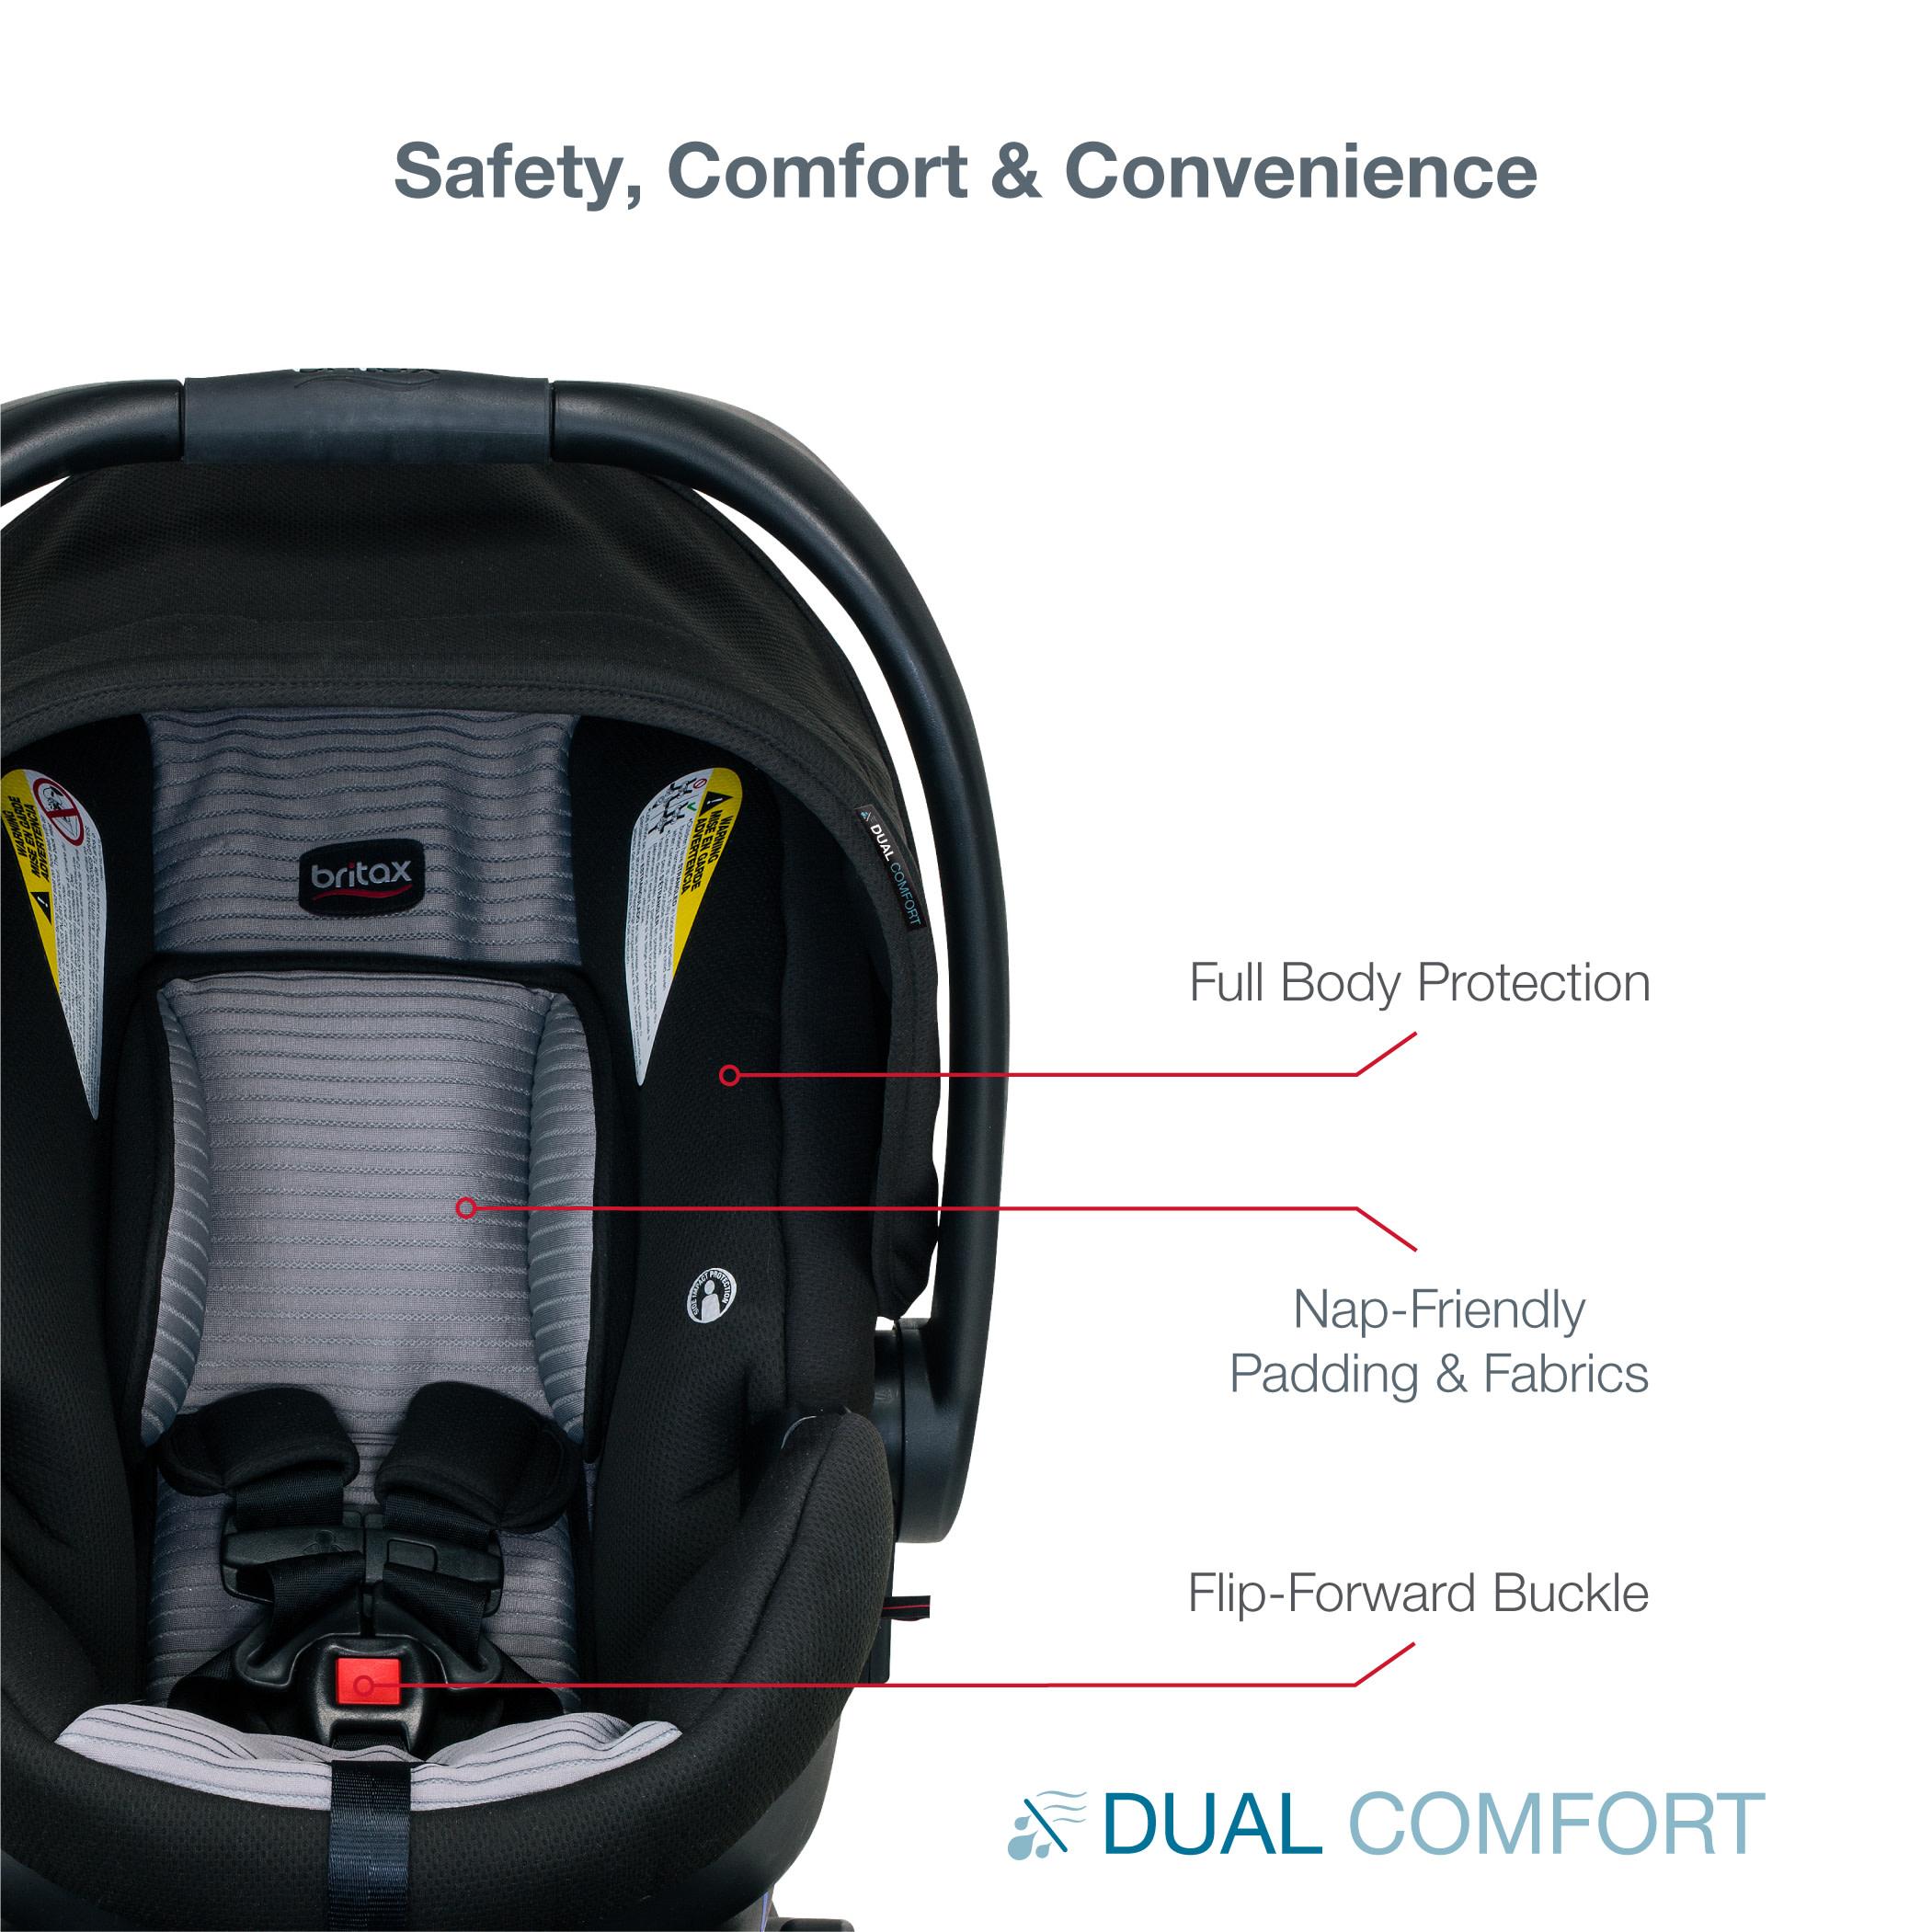 Britax B Safe 35 Infant Car Seat, How To Wash Britax B Safe 35 Car Seat